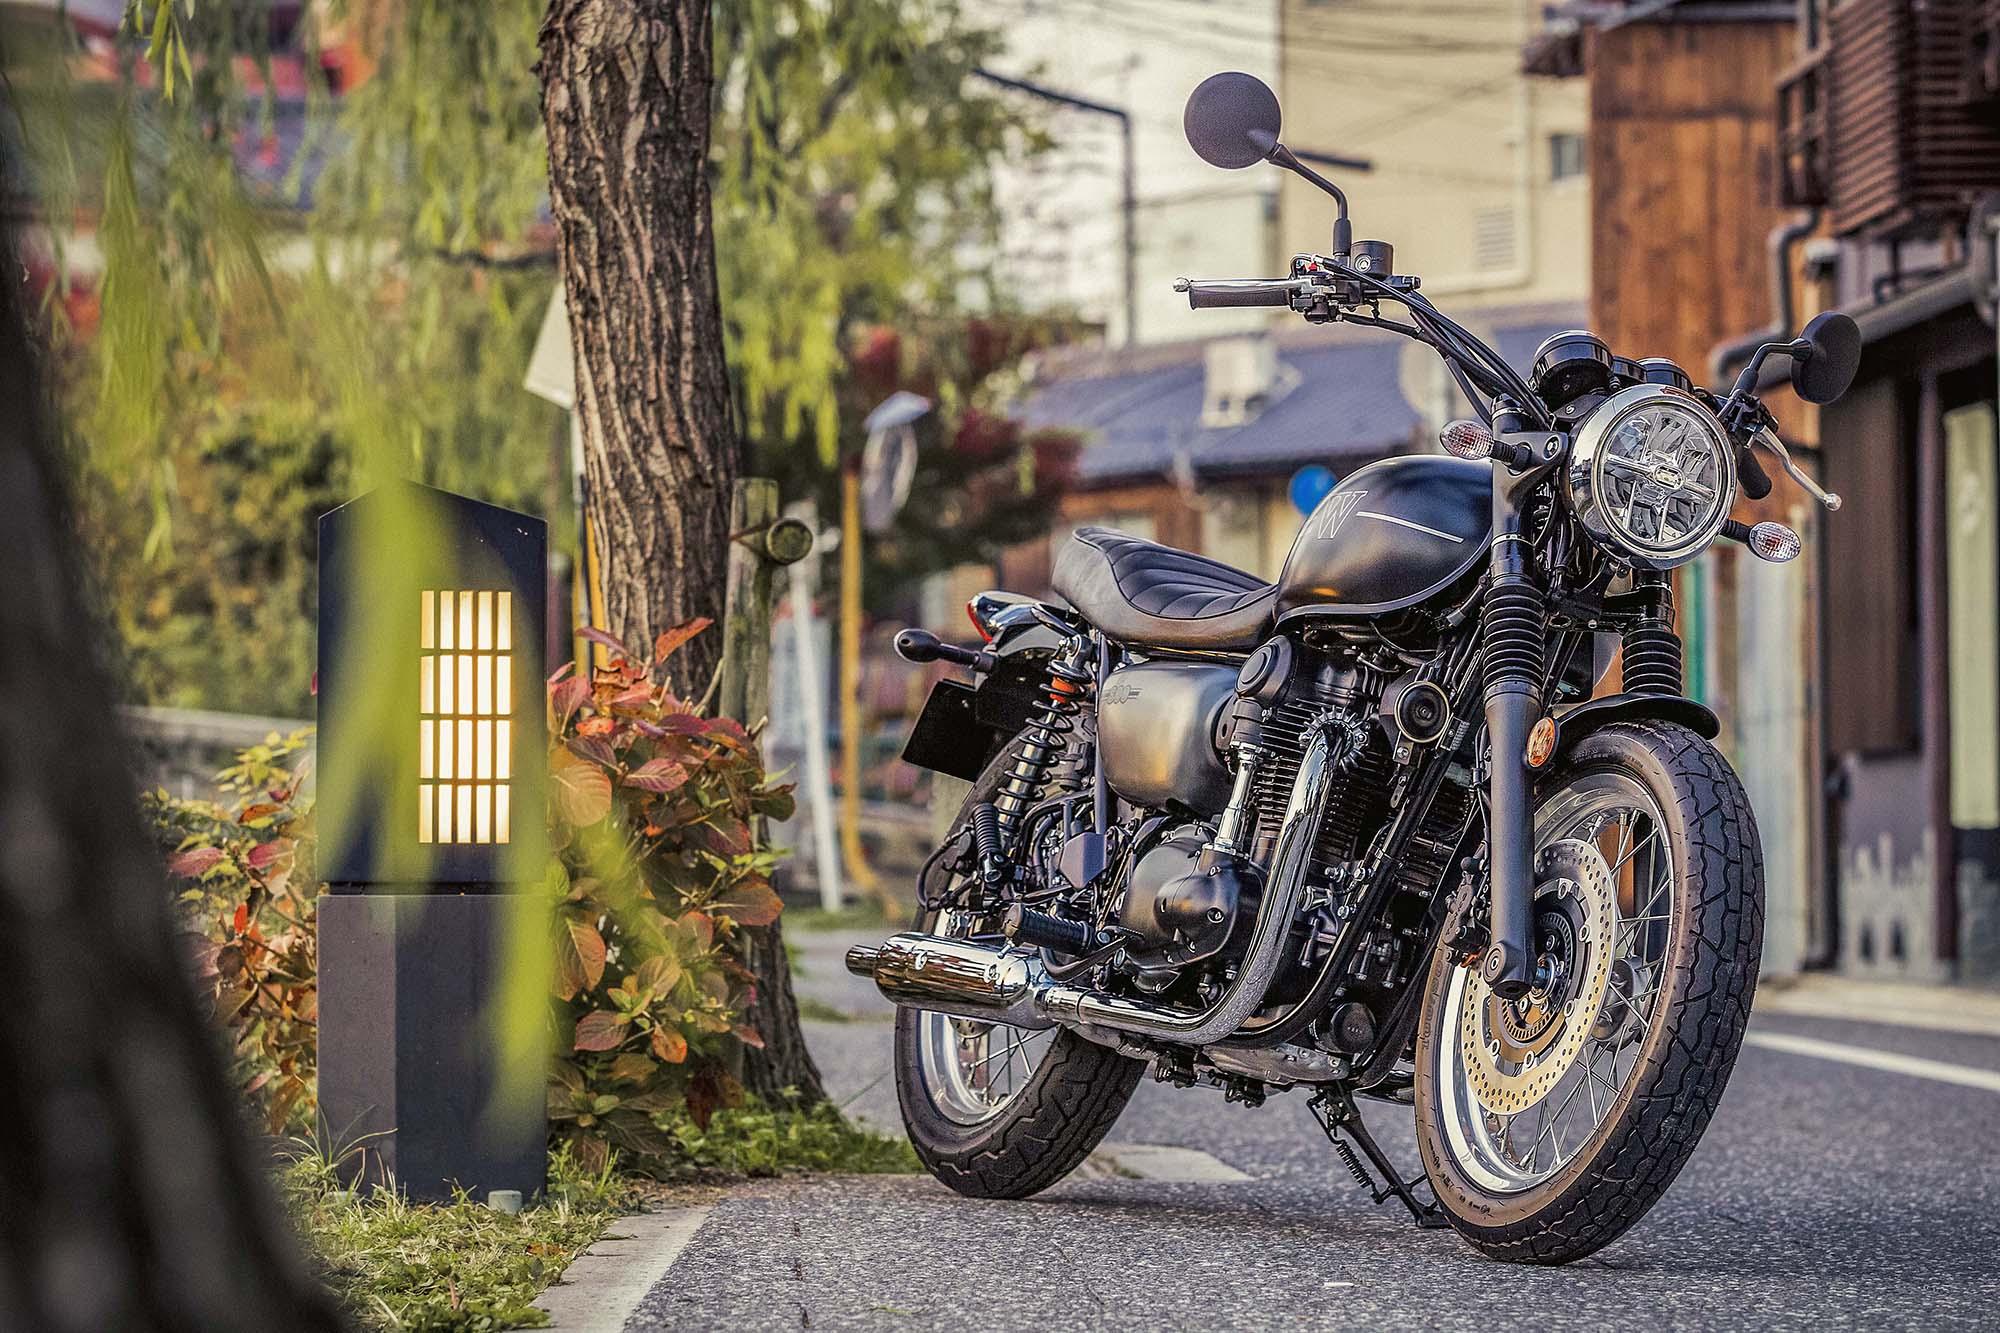 Kawasaki W800 Street E W800 Cafe 16